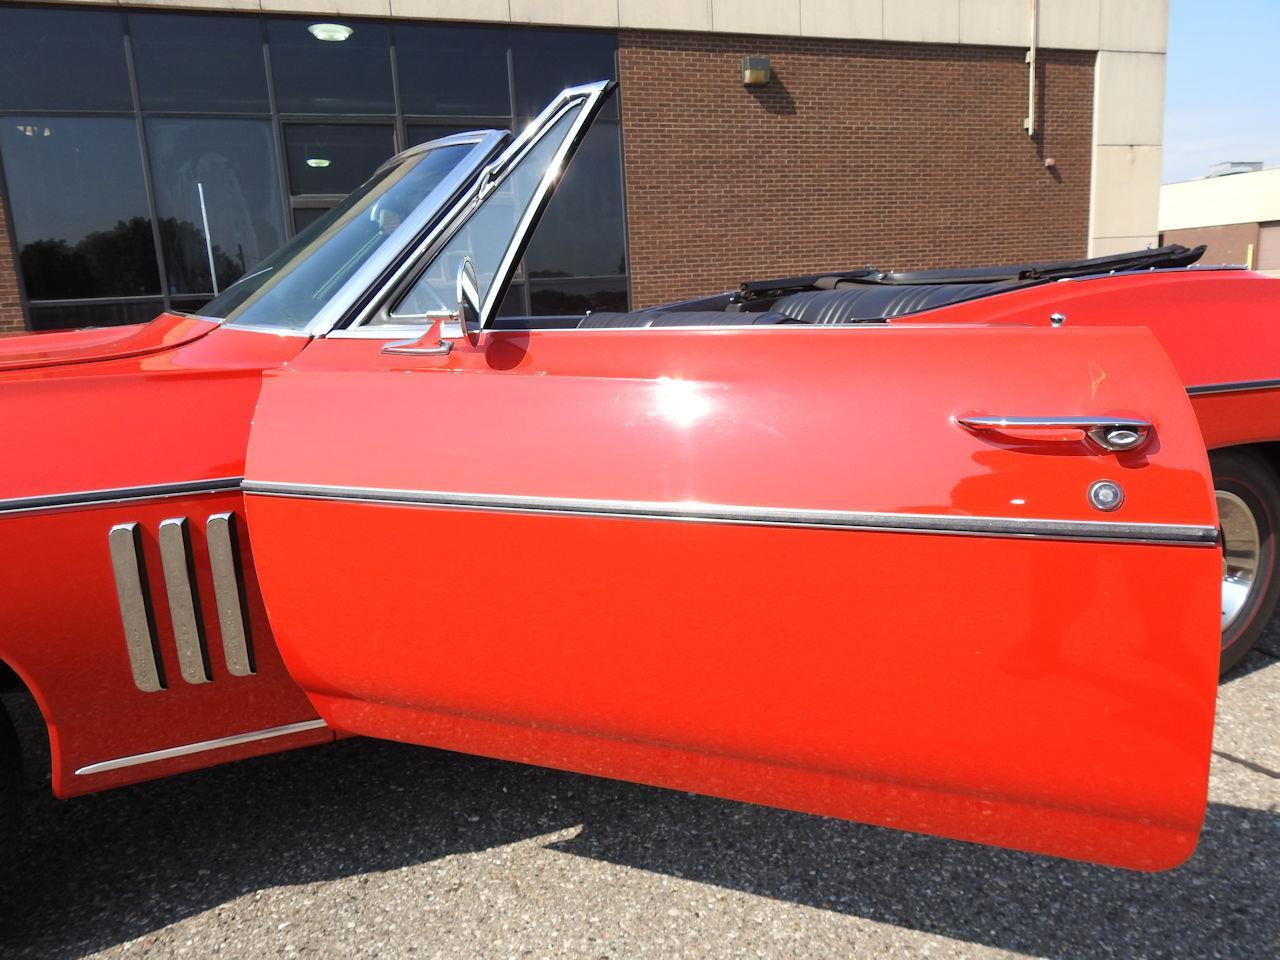 1968 Chevrolet Impala (CC-1391335) for sale in O'Fallon, Illinois